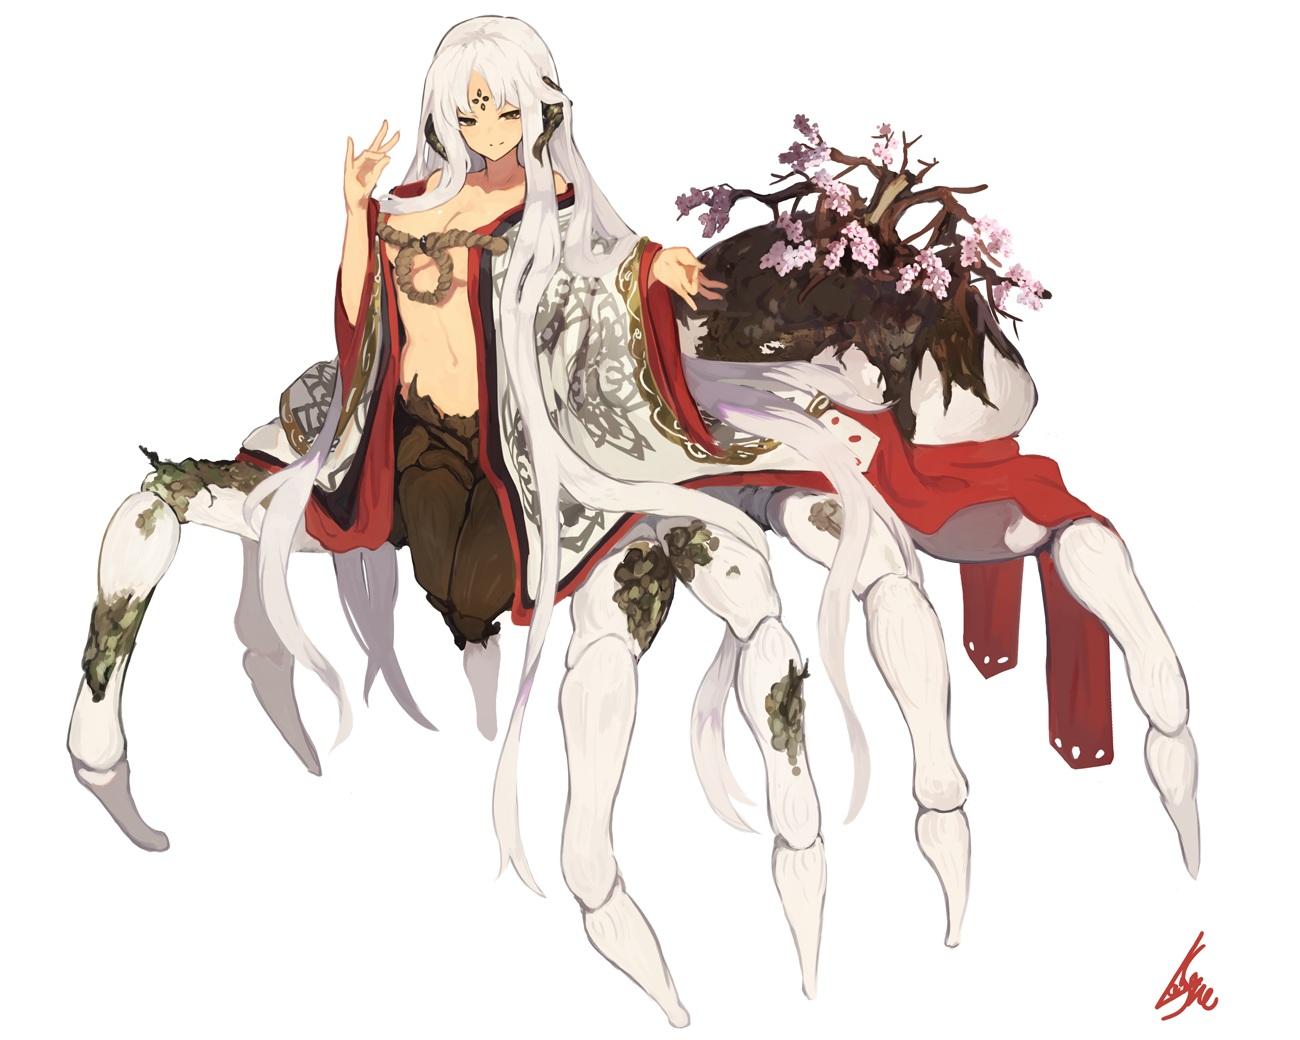 breasts brown_eyes cherry_blossoms flowers horns japanese_clothes kimono lansane long_hair navel no_bra open_shirt original signed white white_hair